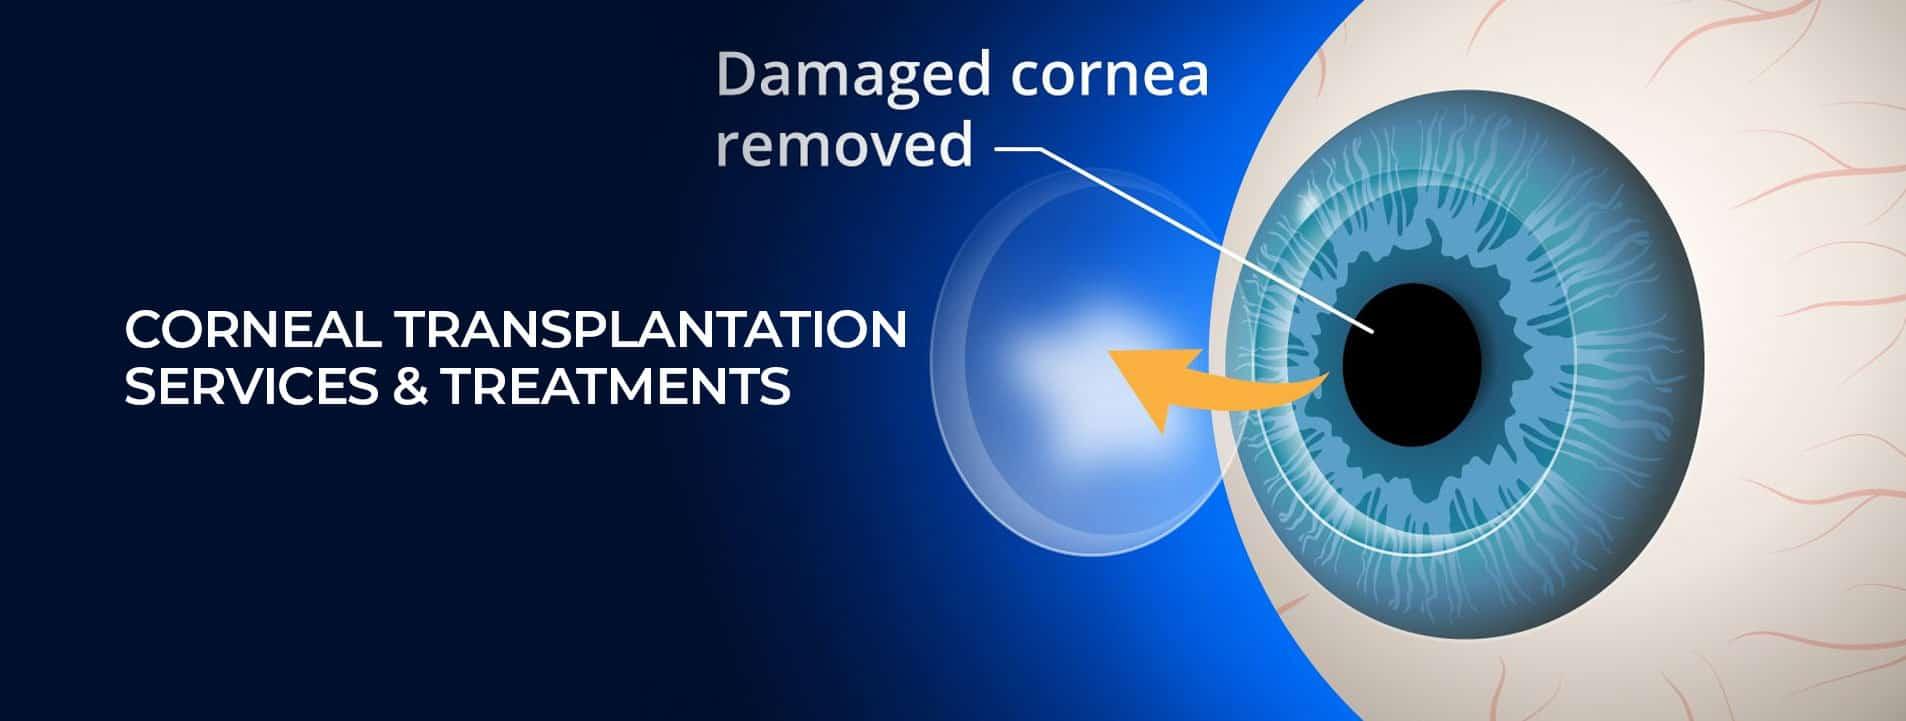 Corneal transplantation services treatments